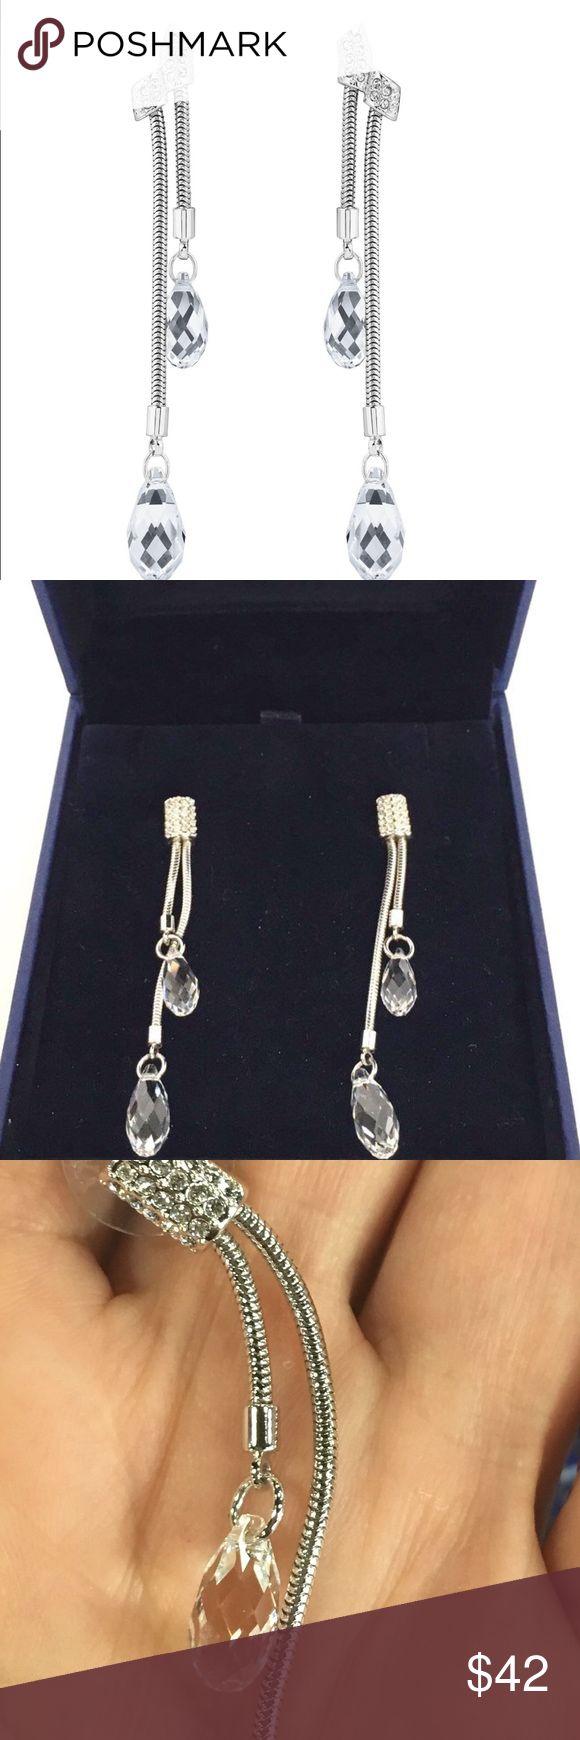 Swarovski Gillian earrings Perfect condition beautiful Swarovski crystal earrings /got as a gift never worn.elegant and stylish ❄️❄️❄️ Swarovski Jewelry Earrings